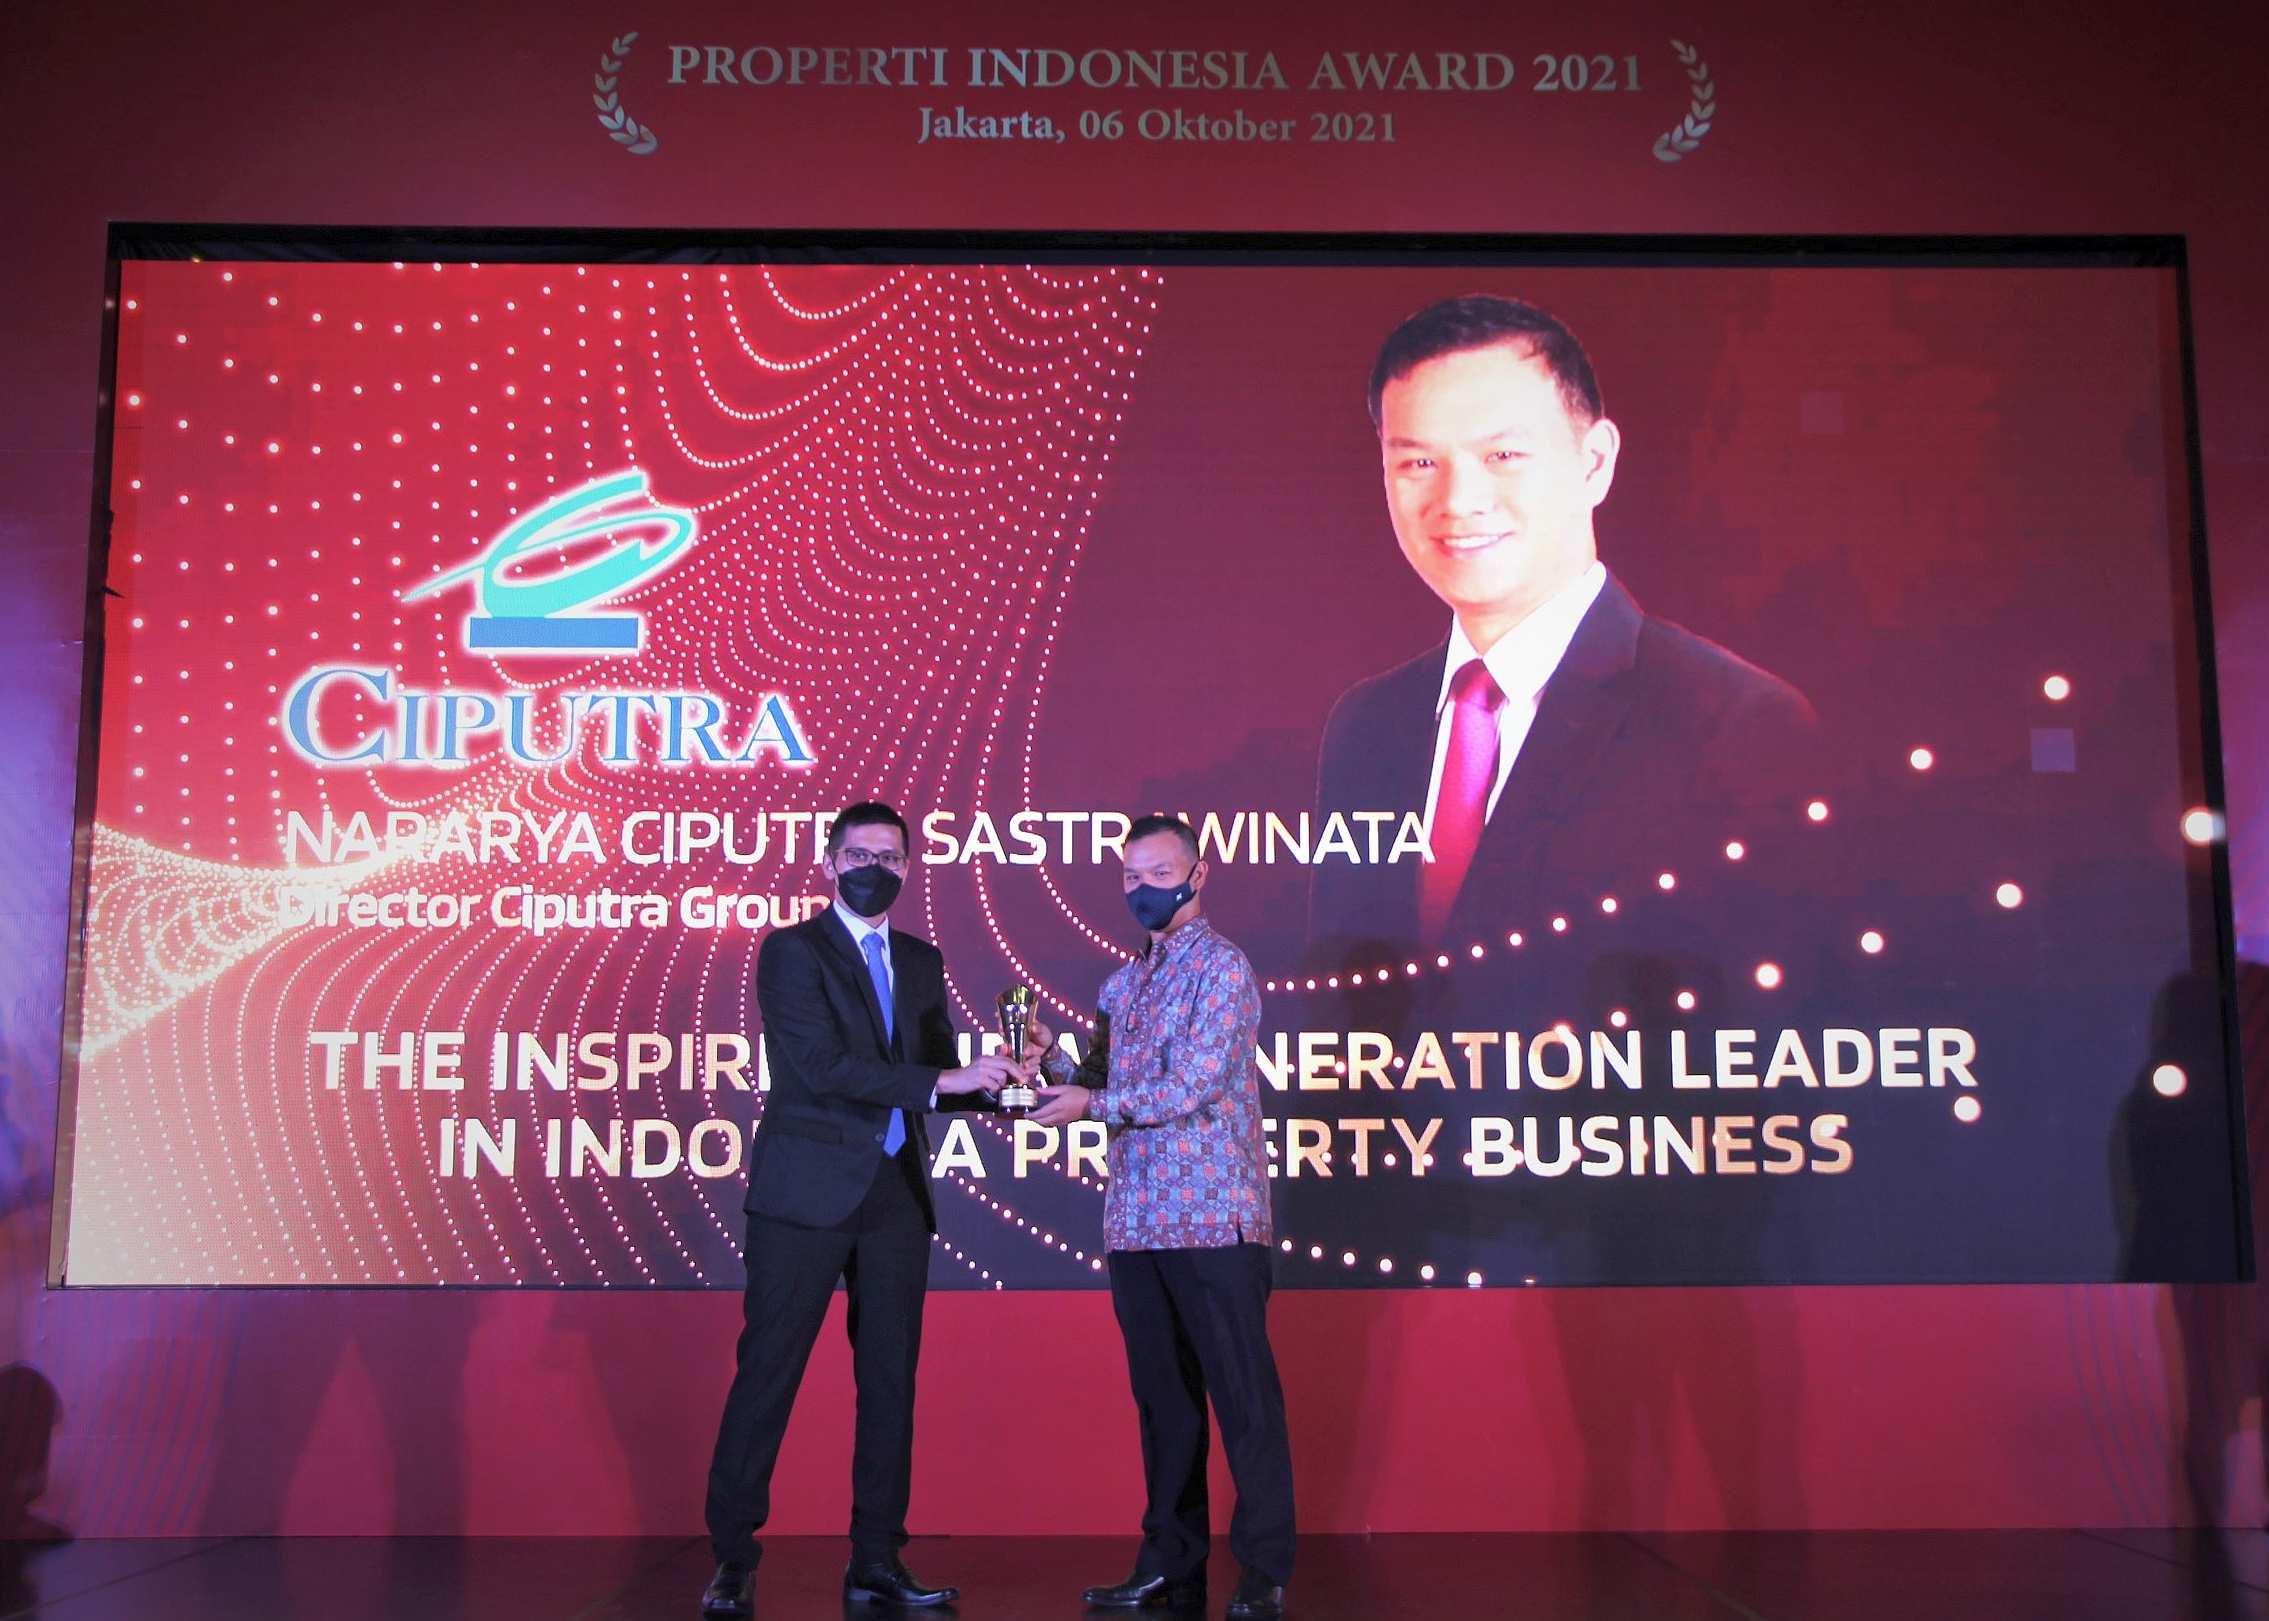 "Mr. Nararya Ciputra Sastrawinata received ""The Inspiring New Generation Leader in Indonesia Property Business Award"""